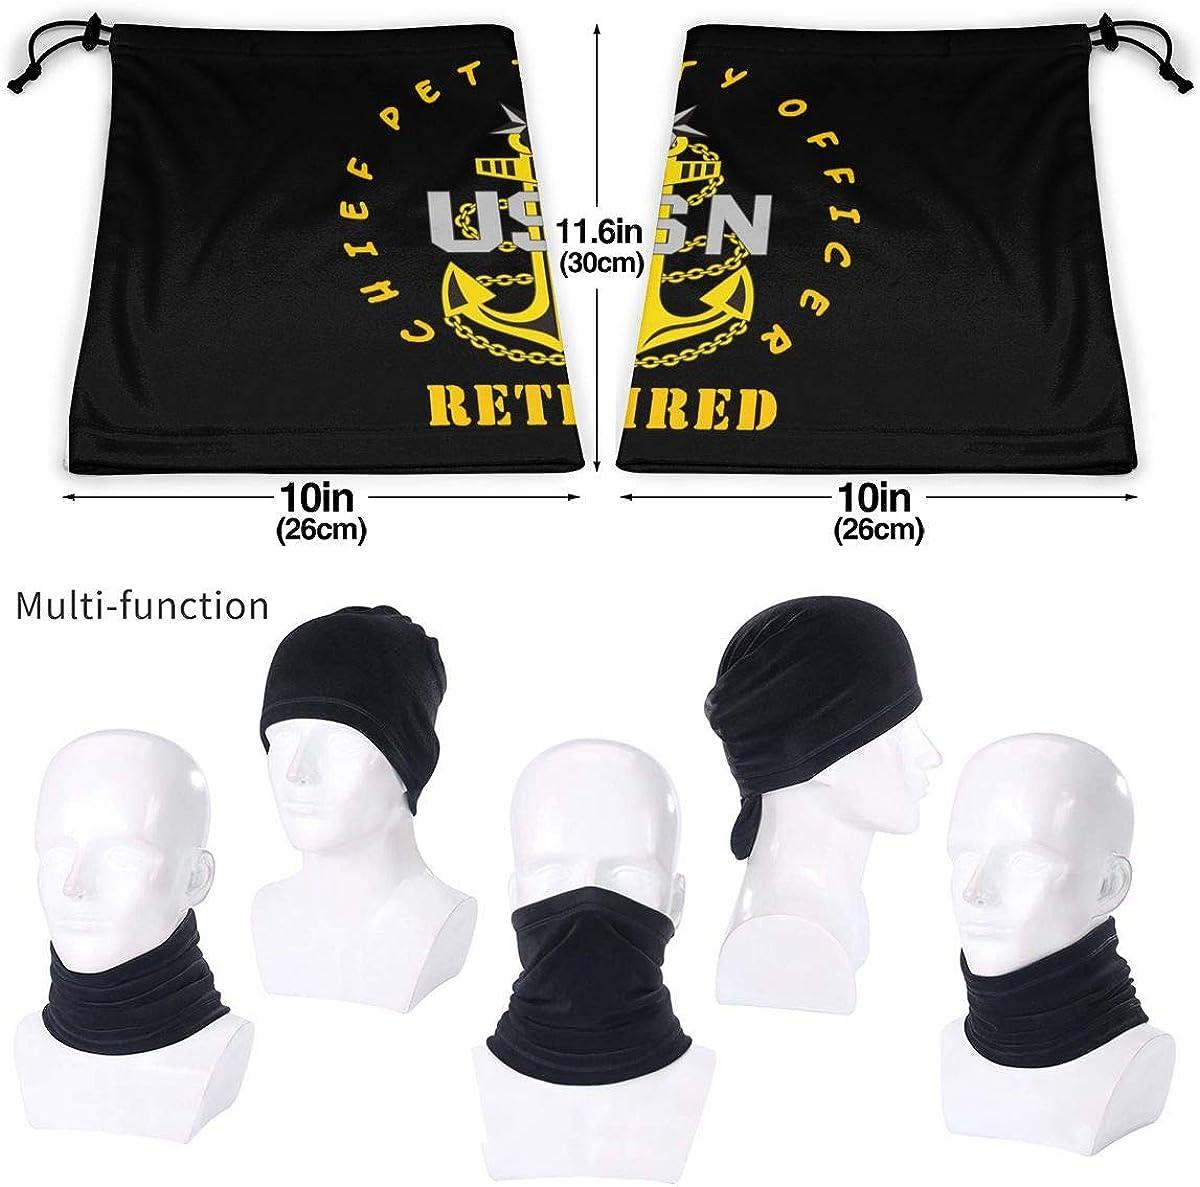 US Navy Senior Chief Petty Officer Retired Unisex Bandana Face Mask Warmer Neck Tube for Dust Wind Sun Protection